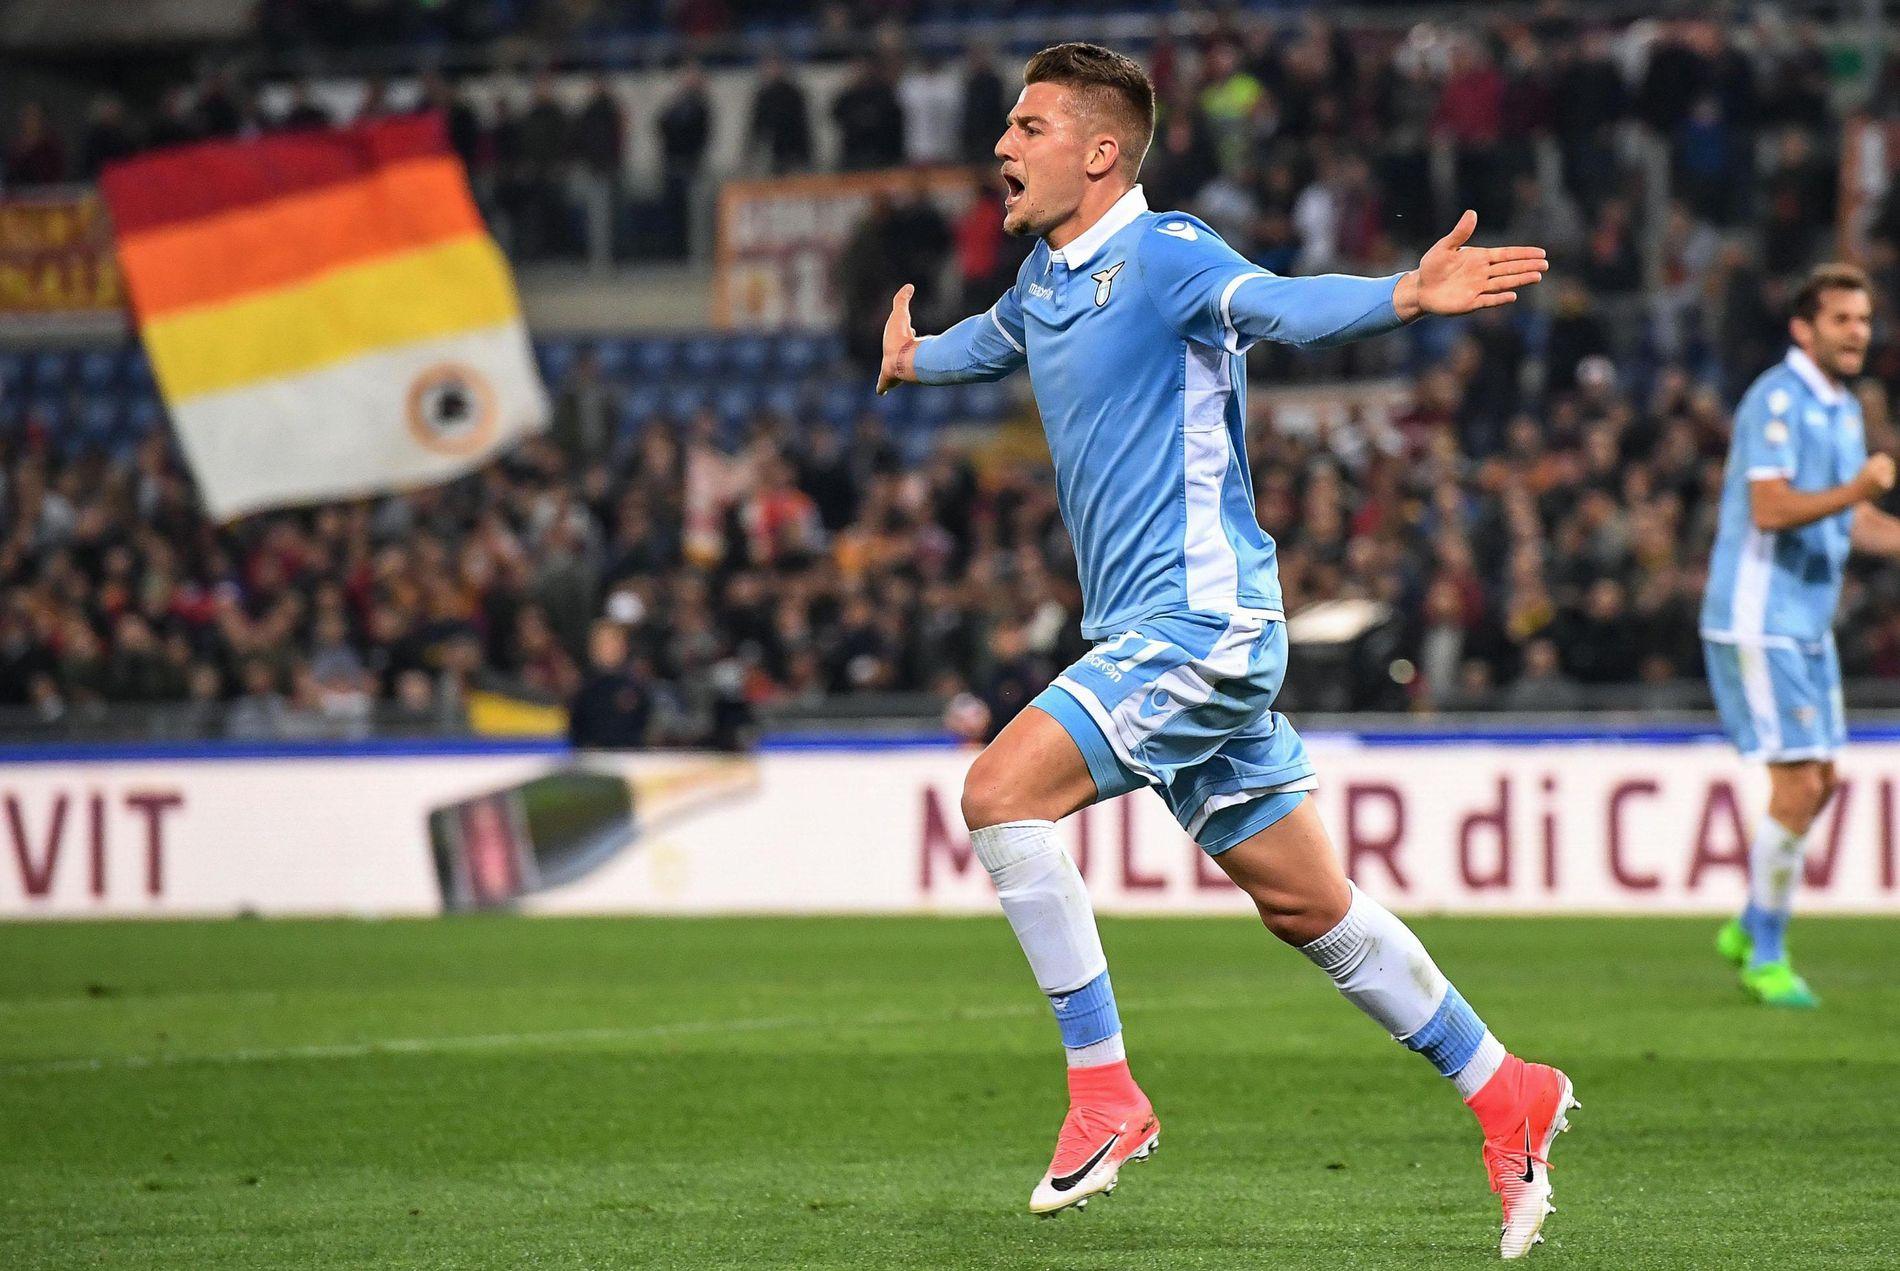 ETTERTRAKTET: Lazio-stjernen Sergej Milinkovic-Savid, her etter scoring mot Roma i en cupkamp i april.